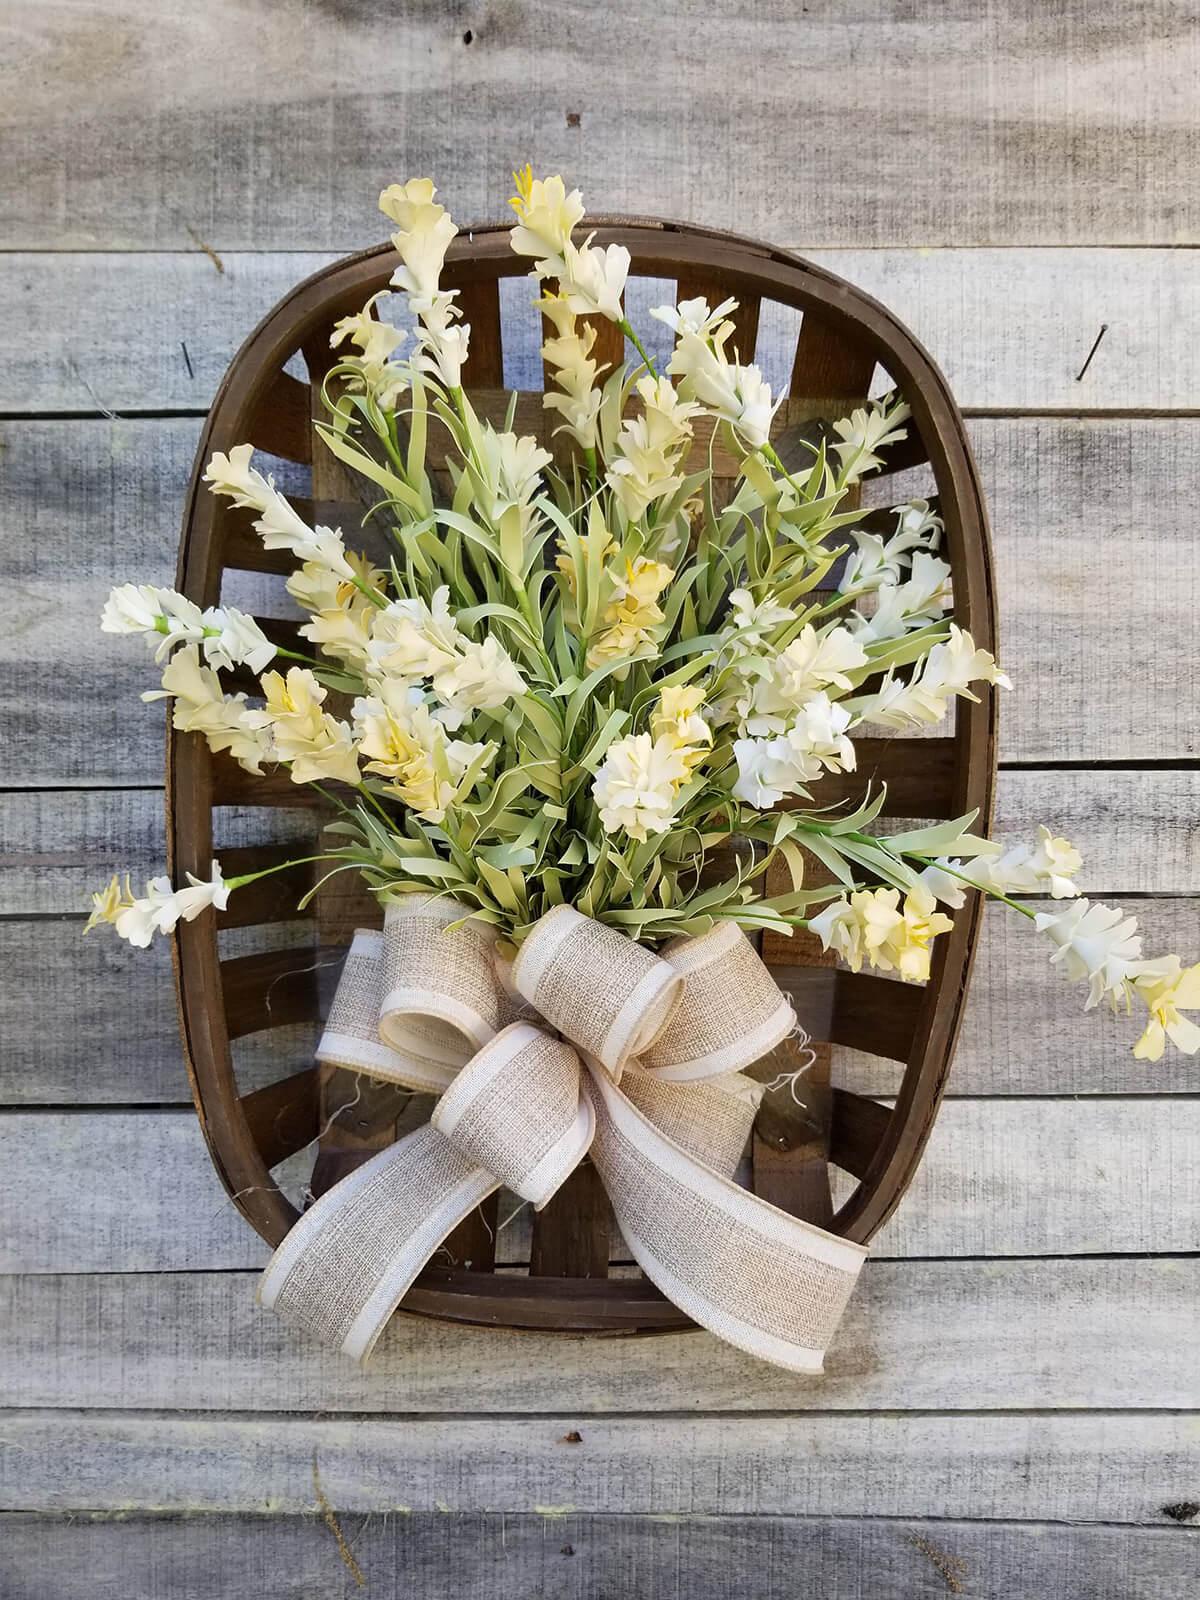 14 Best Farmhouse Style Flower Arrangements Ideas and